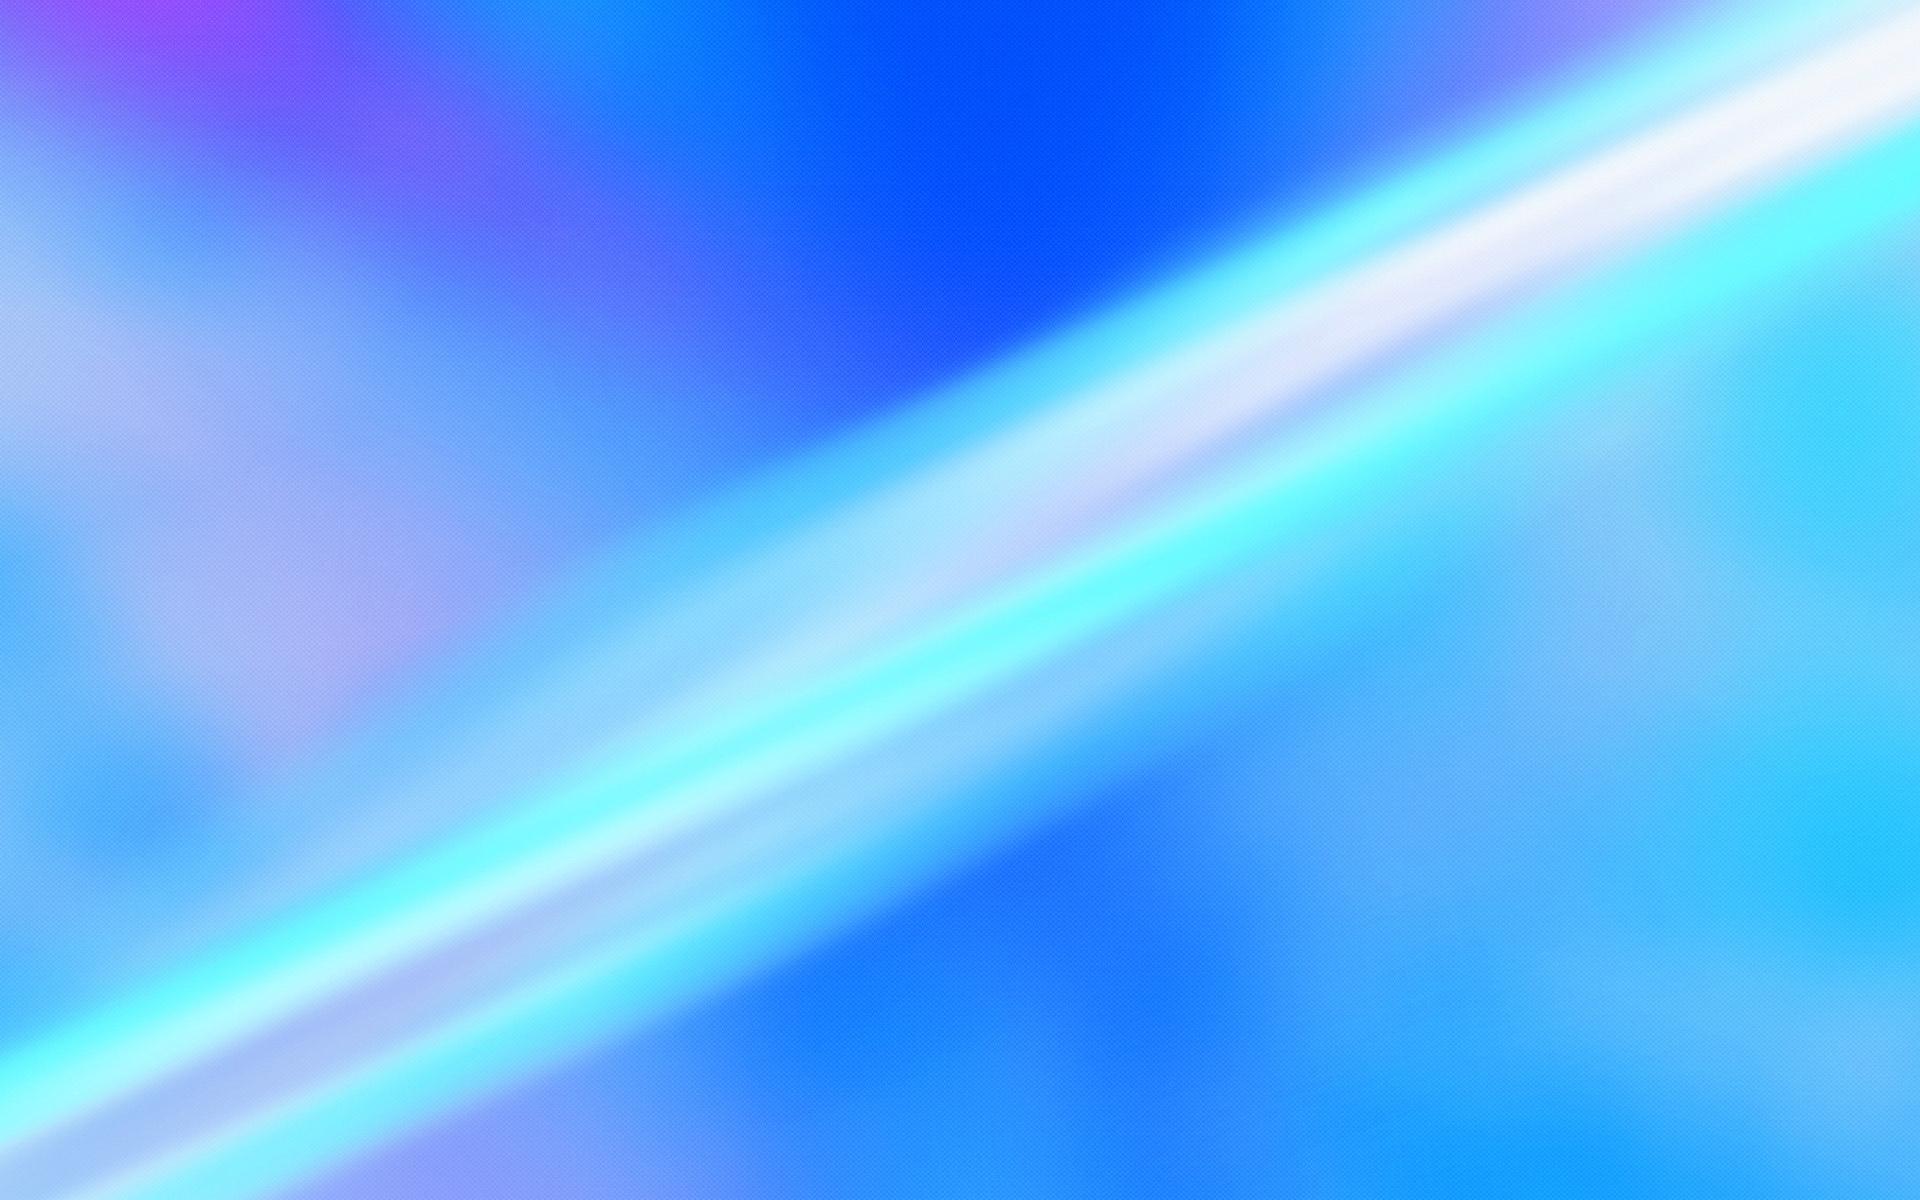 Light Blue Lines HD Wallpapers 1920x1200